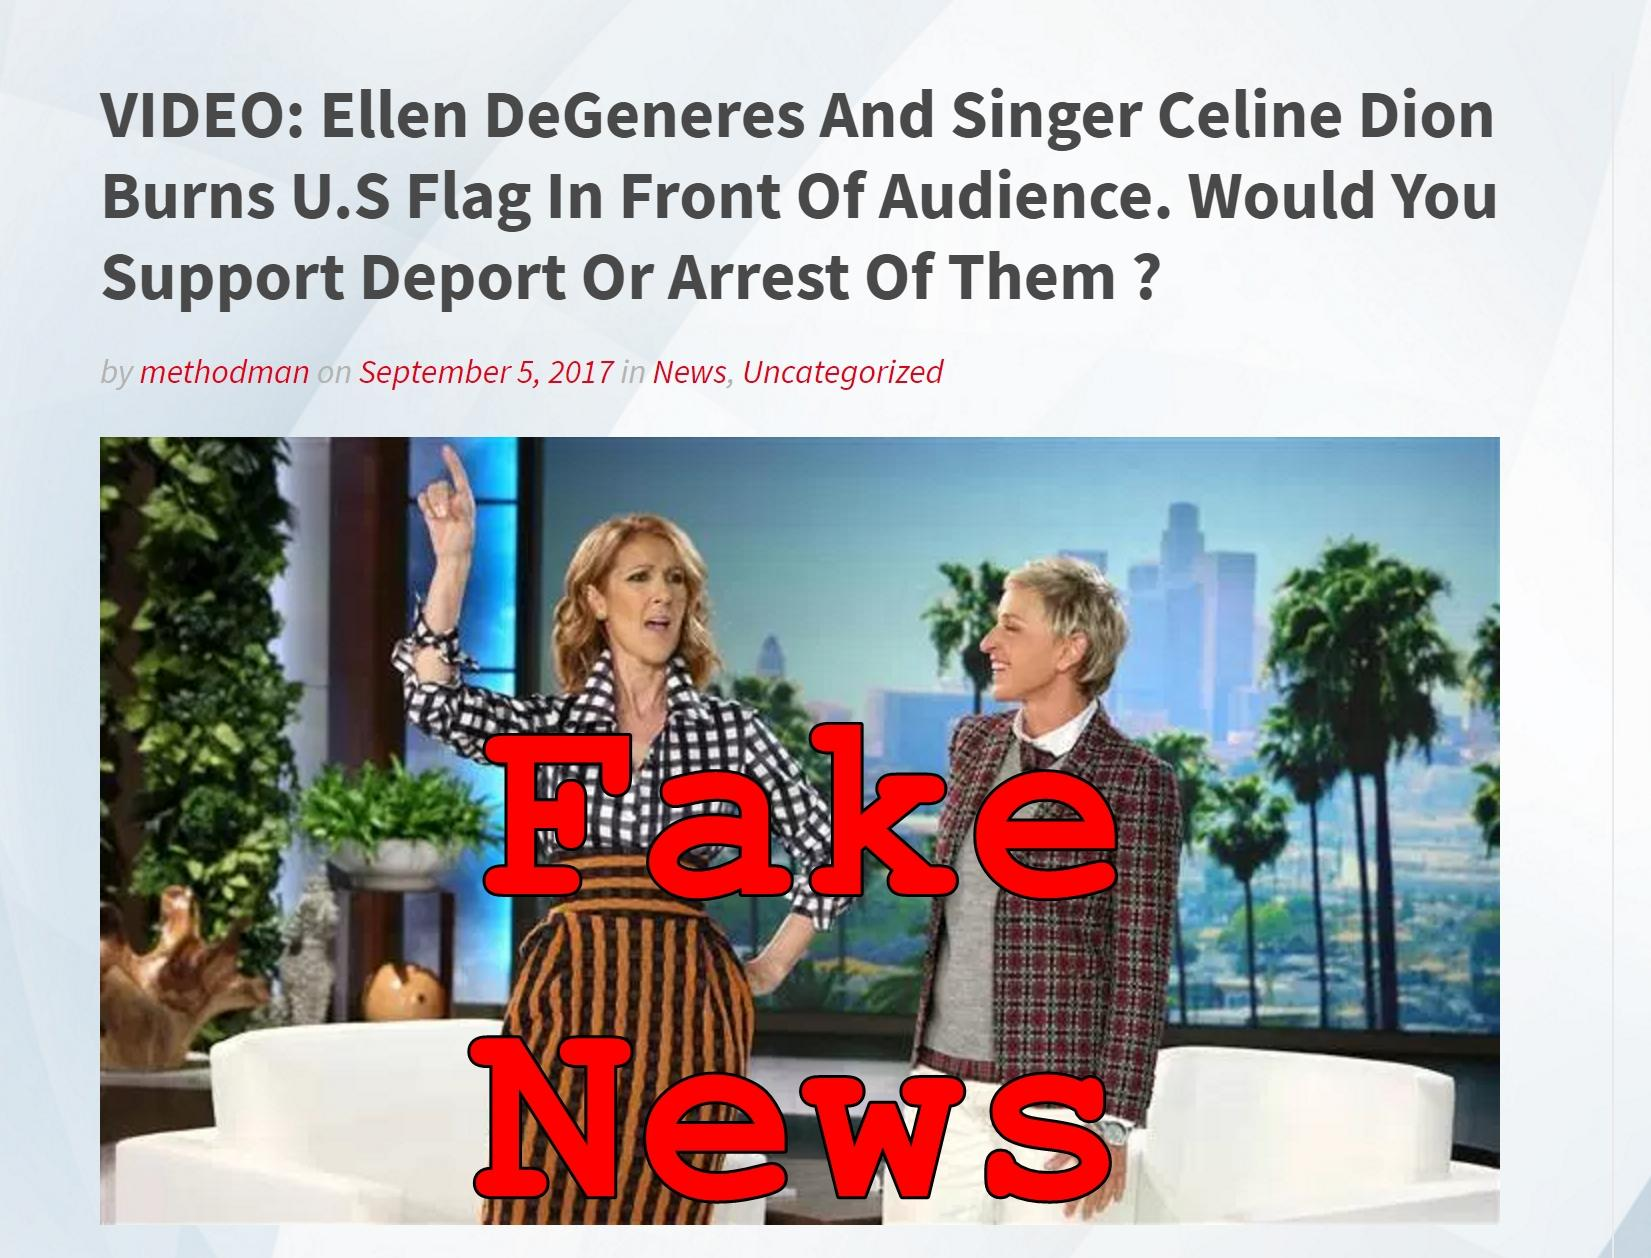 Fake News: Ellen DeGeneres And Celine Dion Did NOT Burn US Flag In Front Of Audience